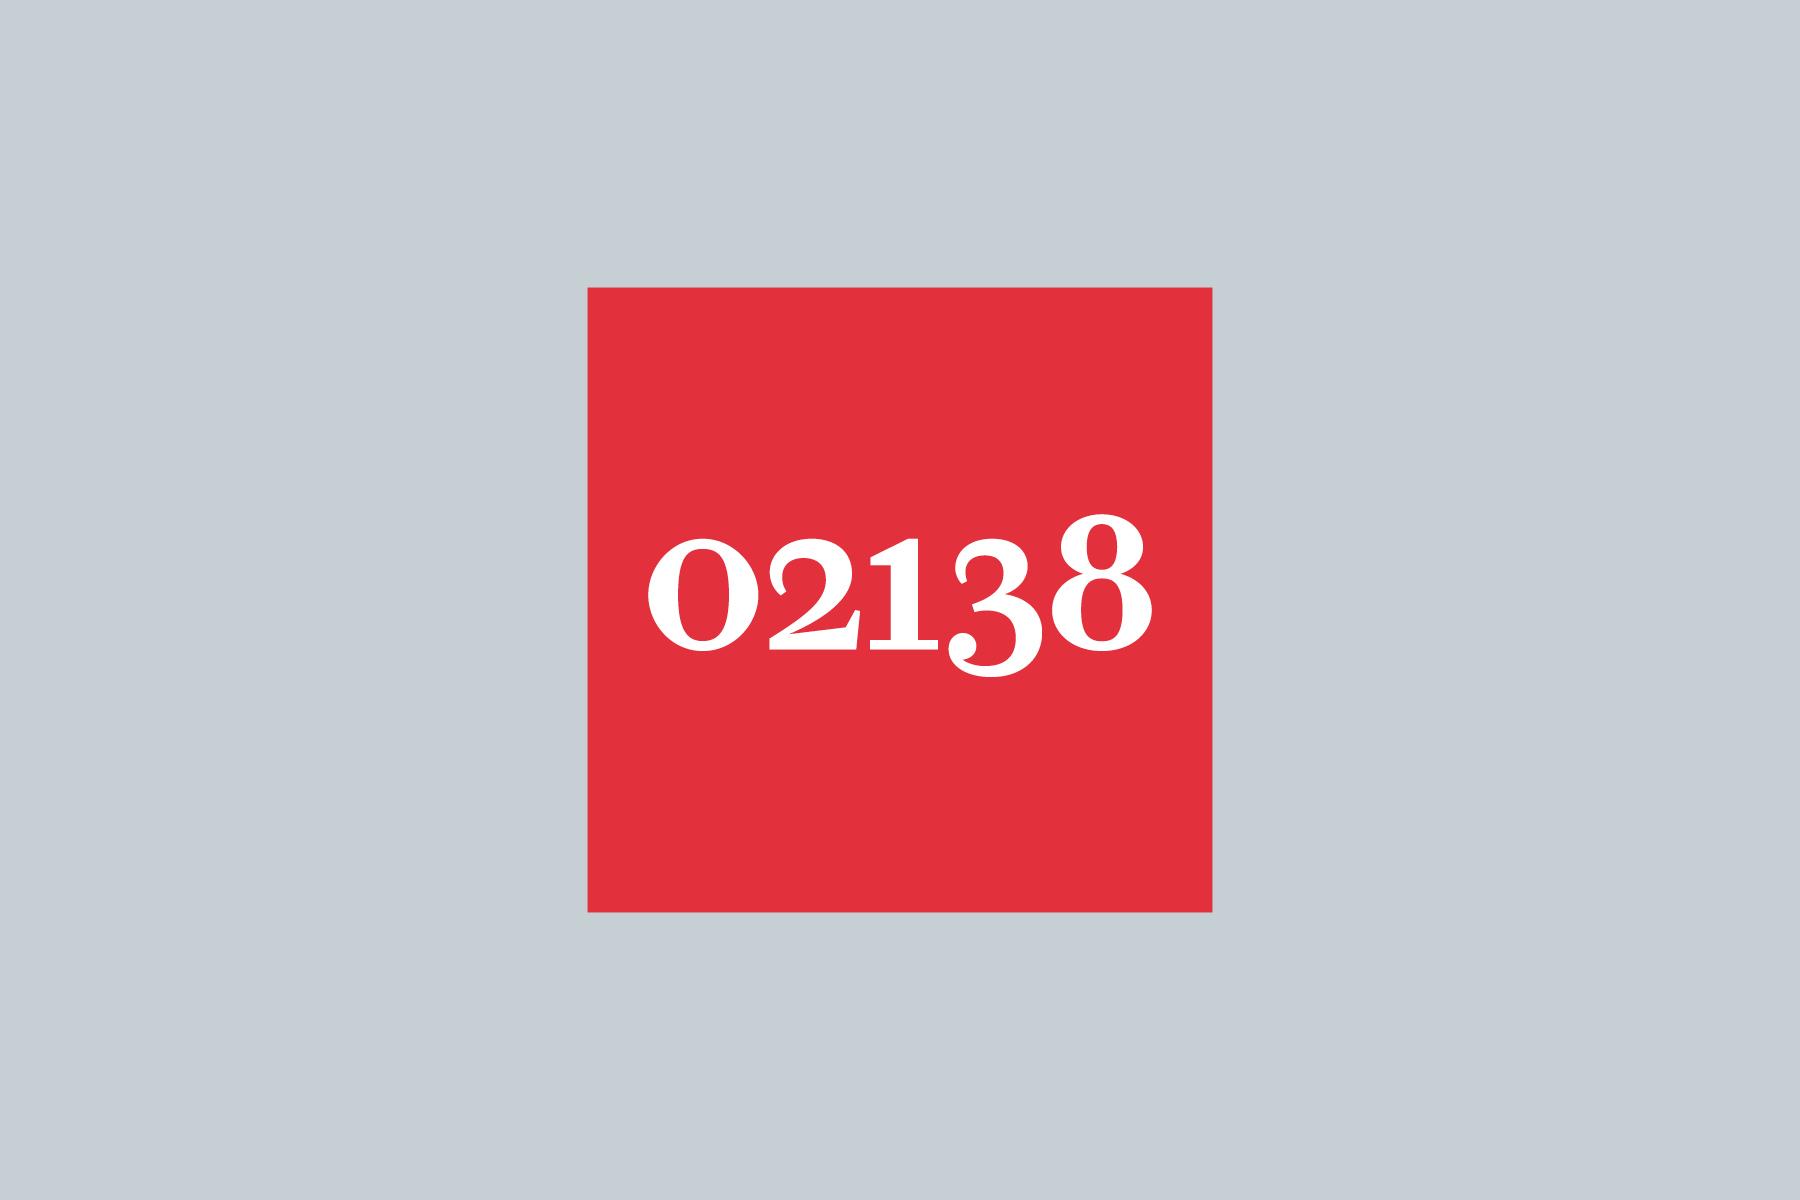 02138-thumb.jpg